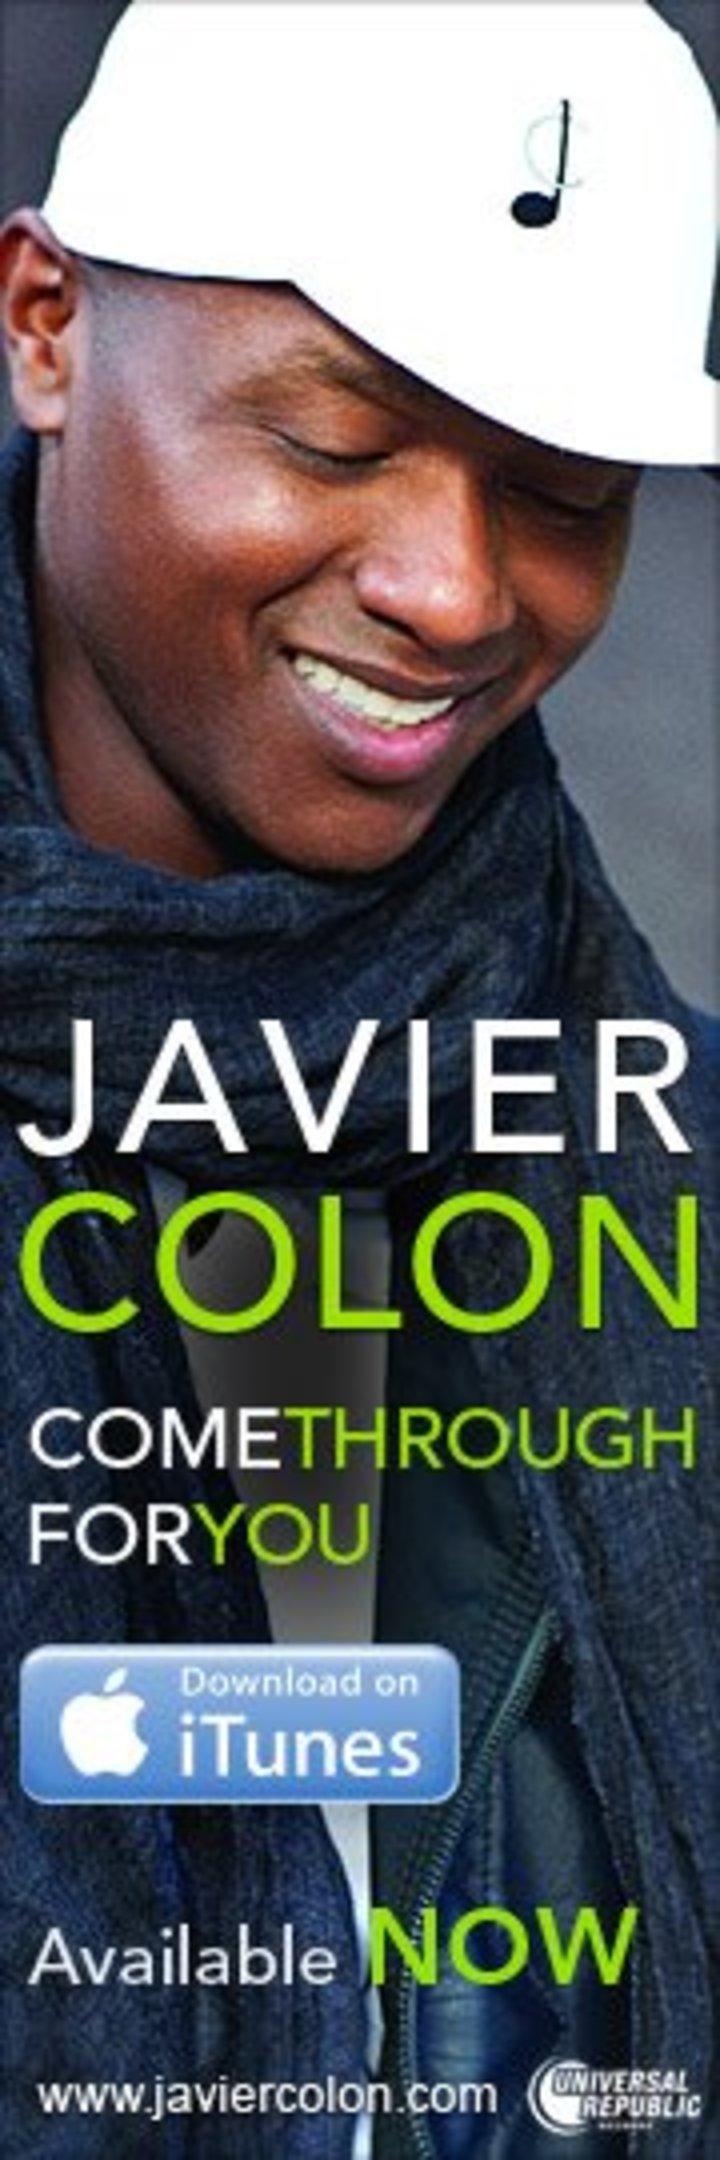 Javier Colon @ Glasgow Royal Concert Hall - Glasgow, United Kingdom